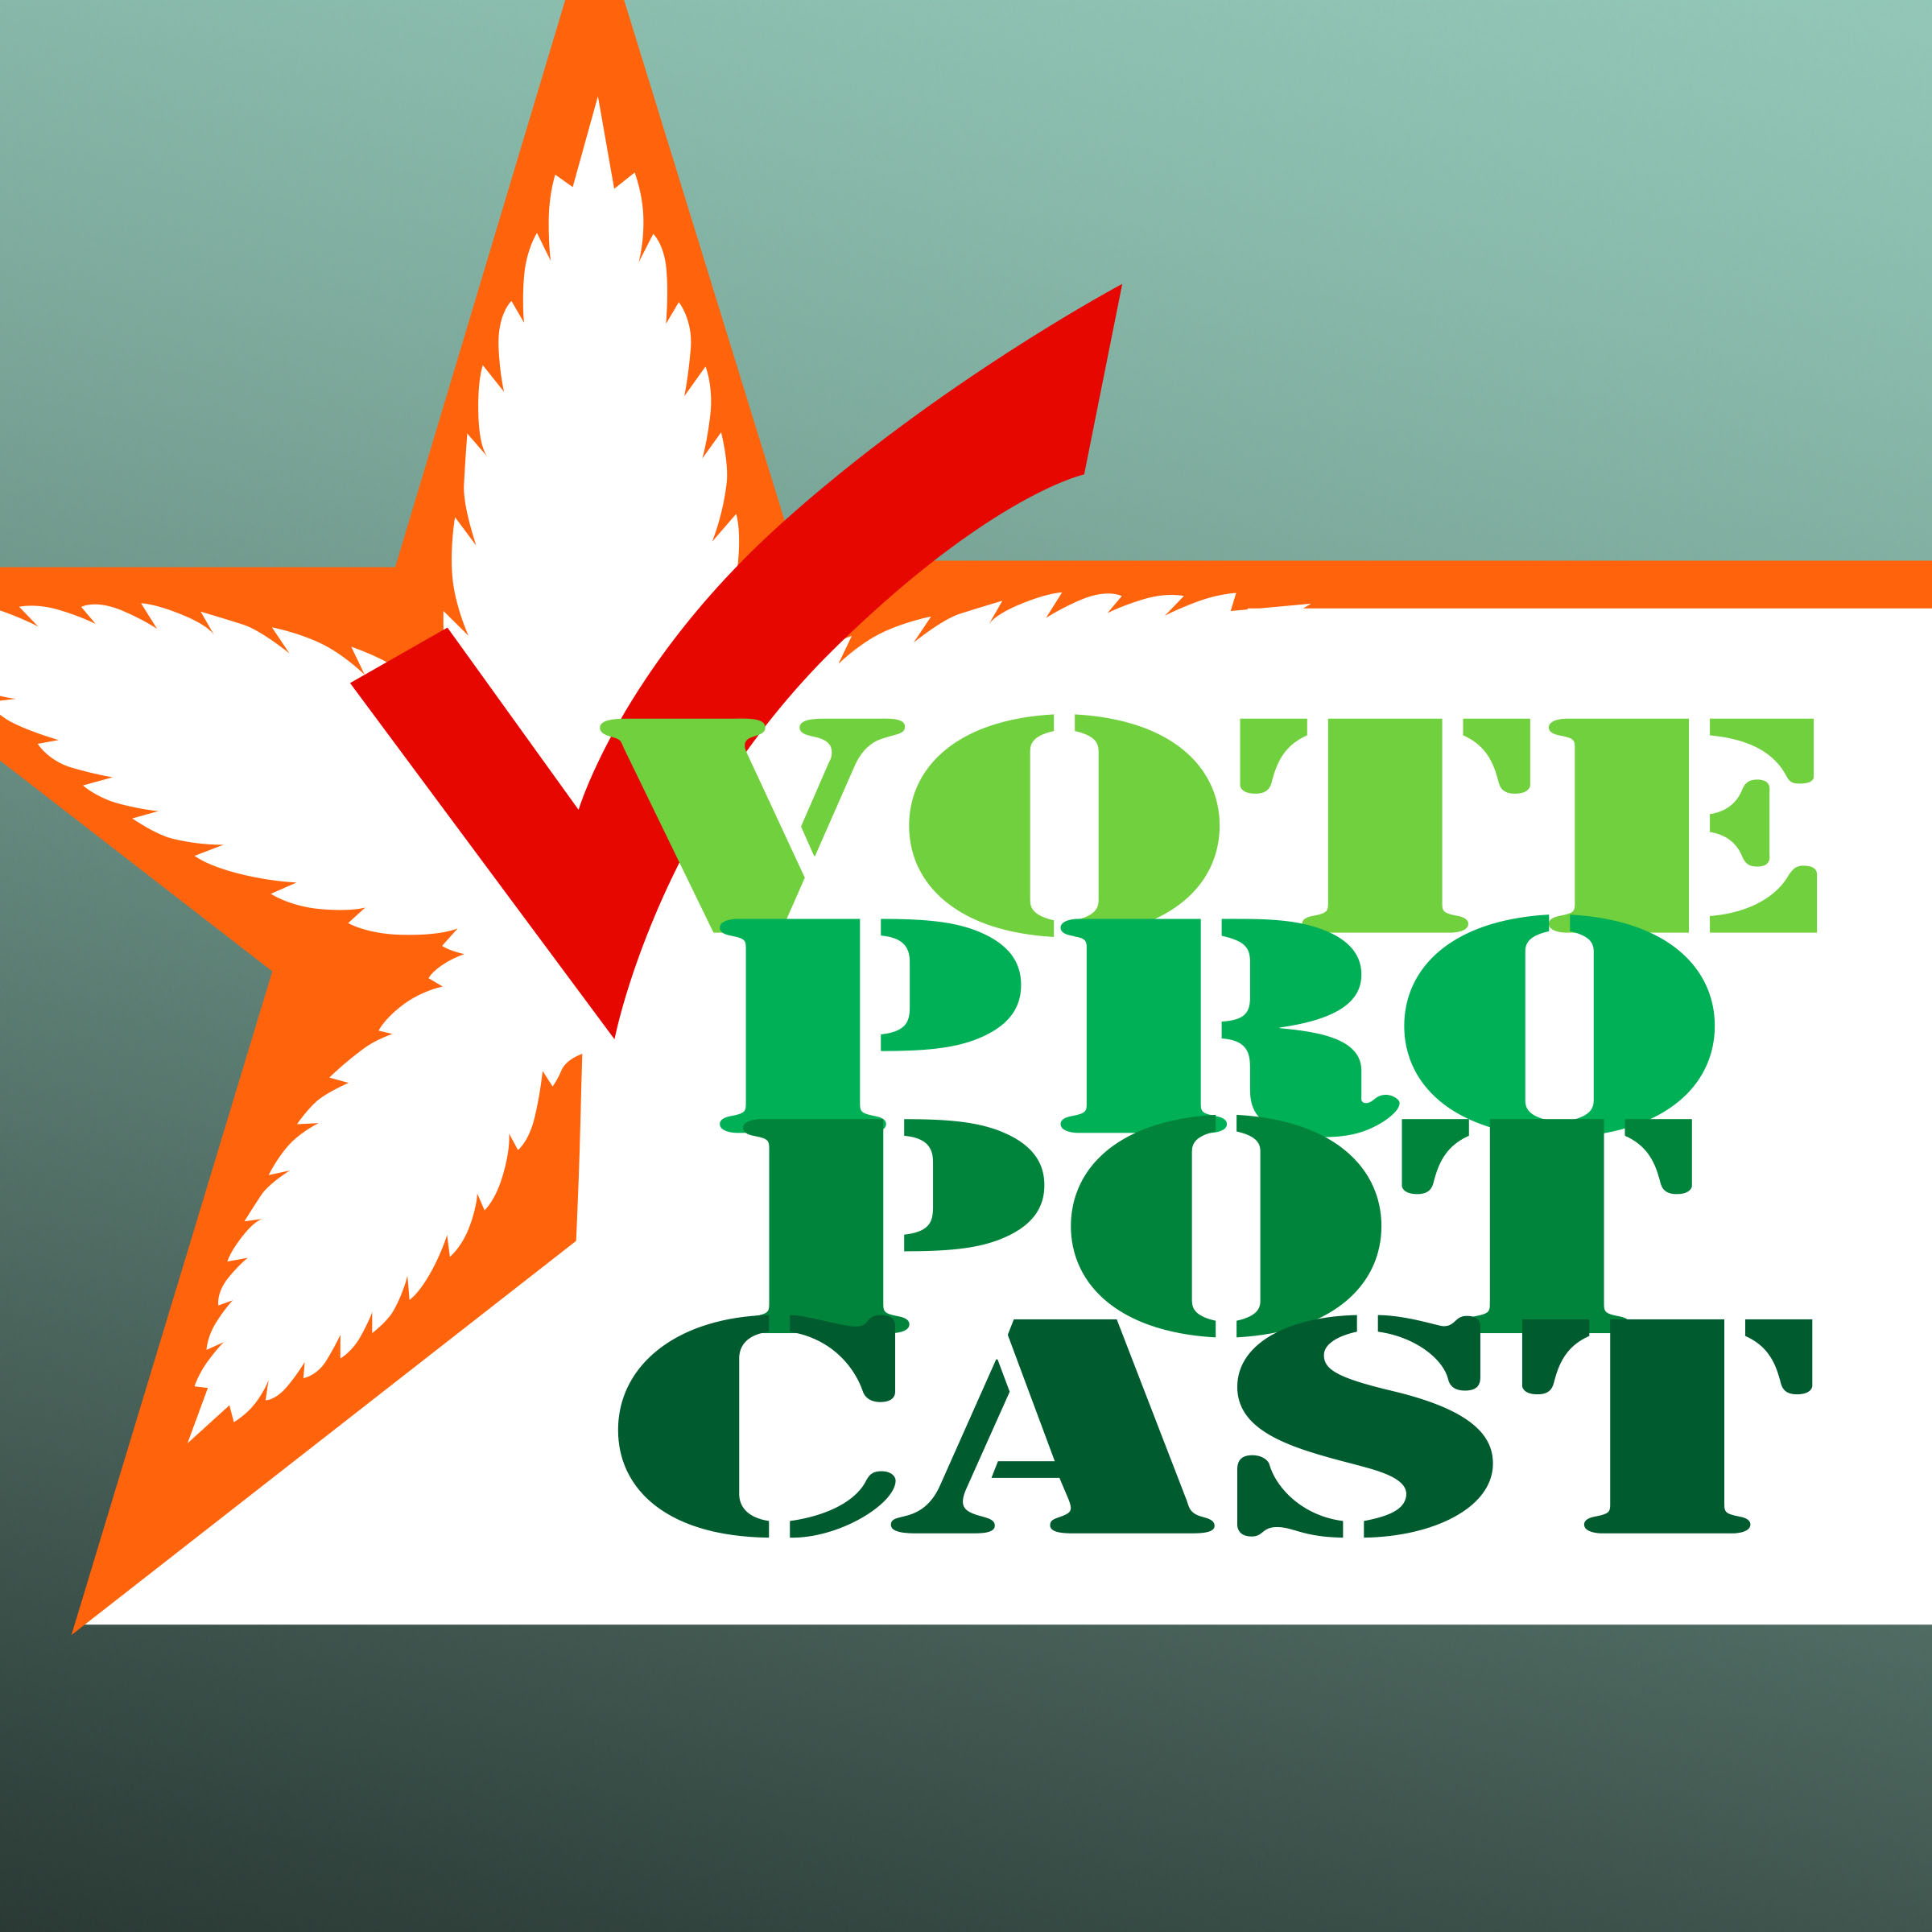 Vote Pro Pot-Cast: Marijuana Politics & Policy show art